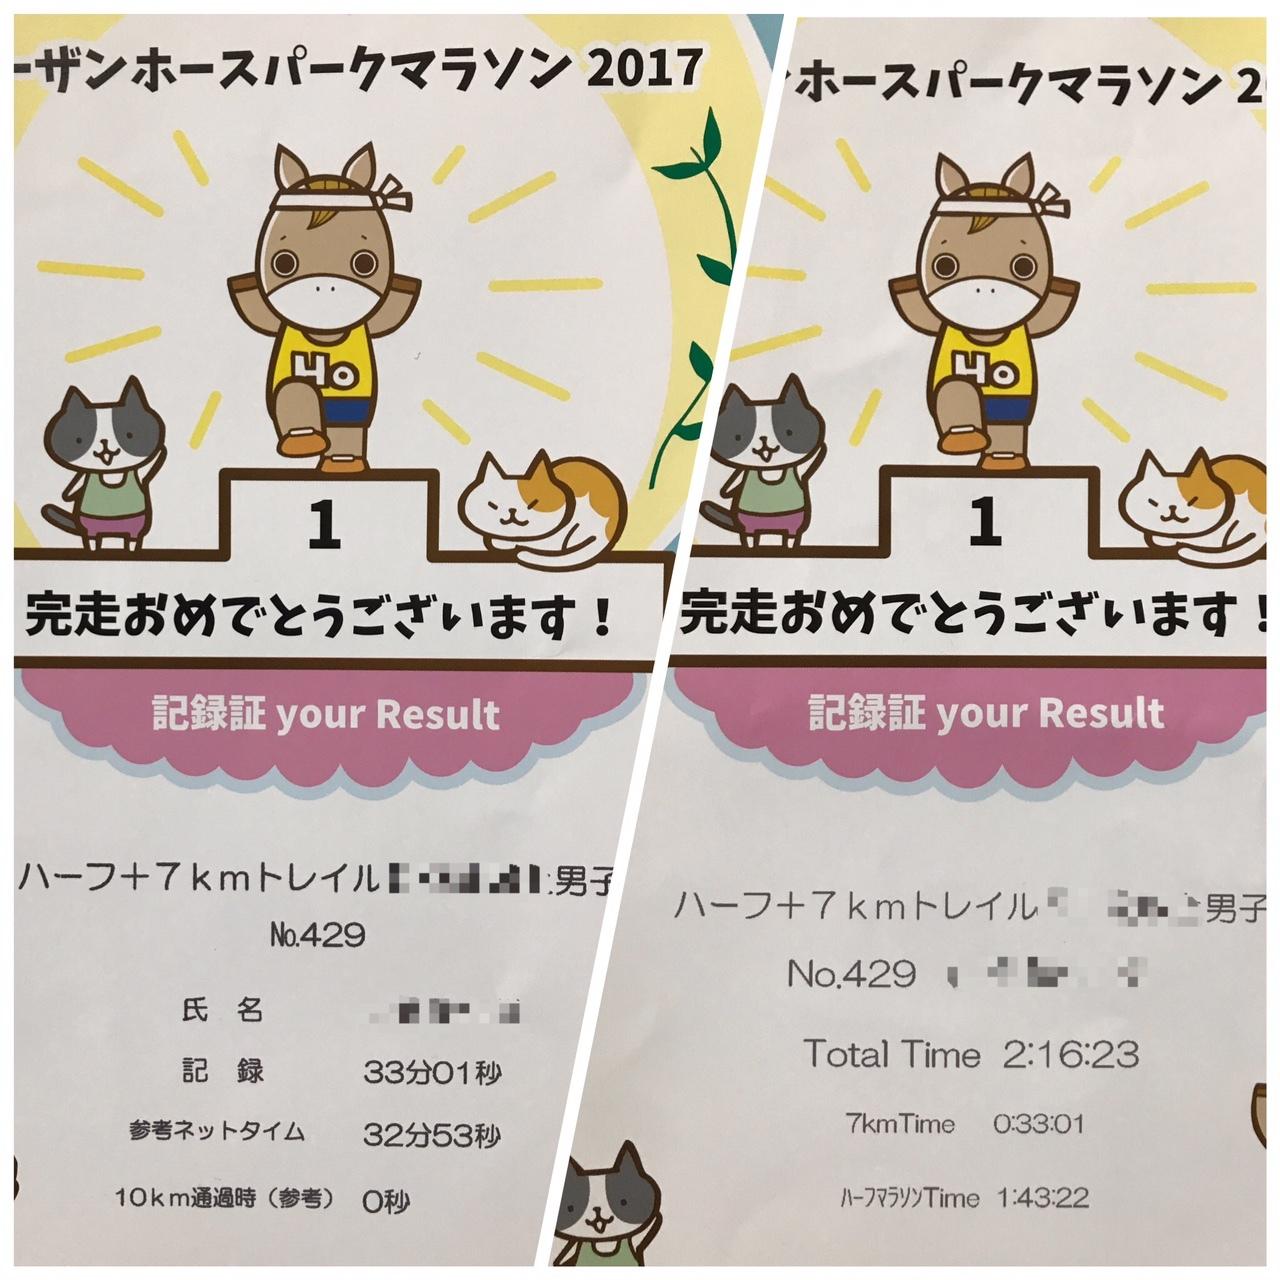 image8_20170608072658cc6.jpg